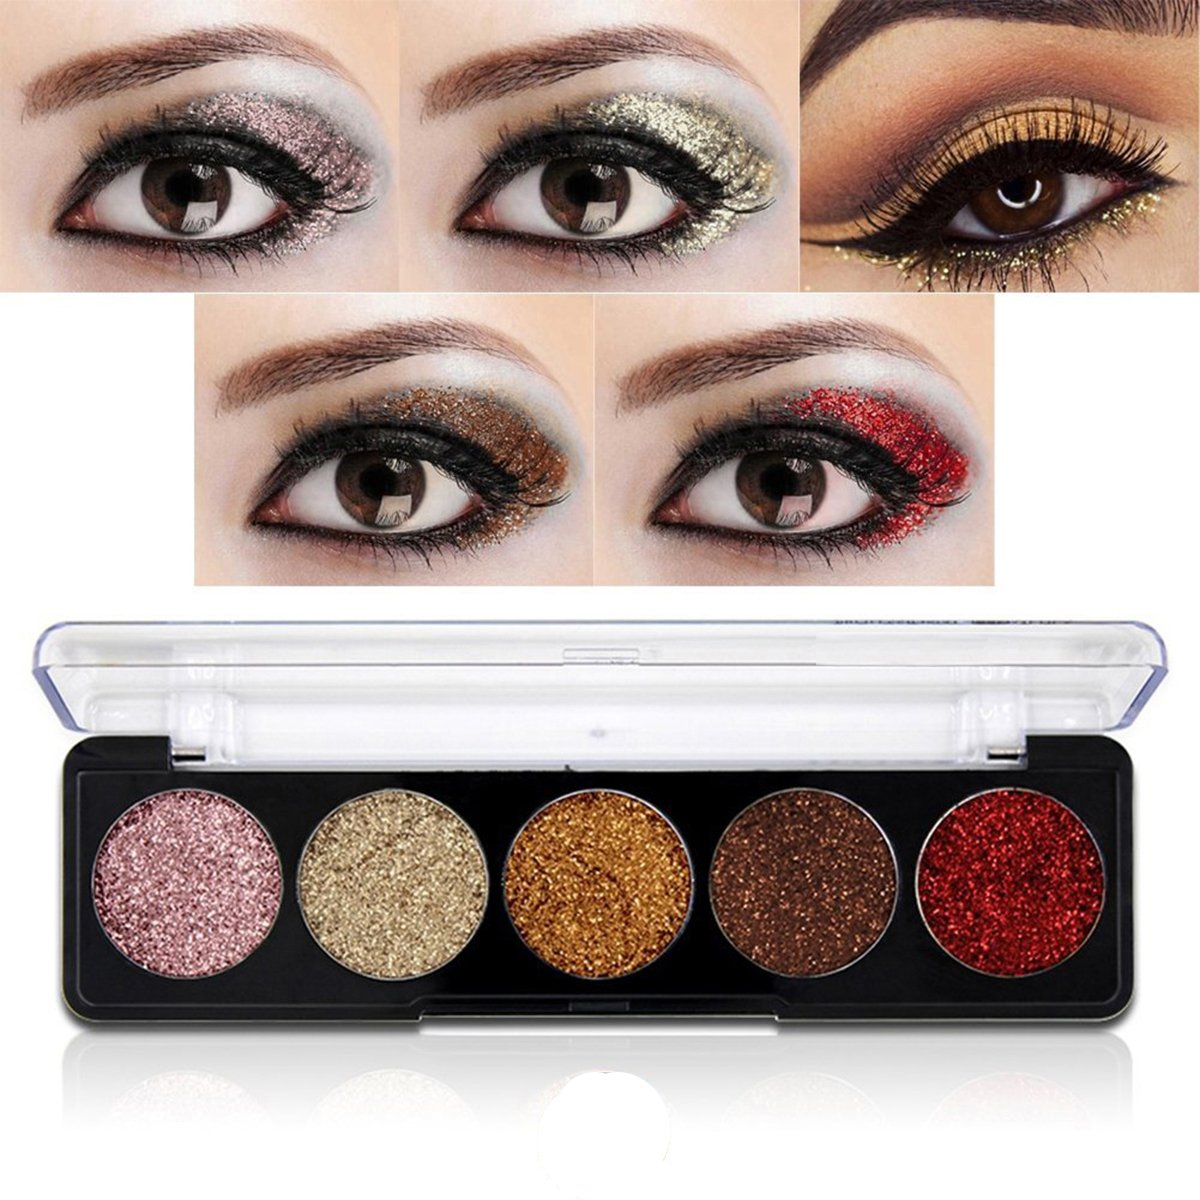 Get Quotations · Glitter Powder Makeup Palette,Vodisa Pressed Glitter Eyeshadow Palette Long-Lasting Metallic Shimmer Eye